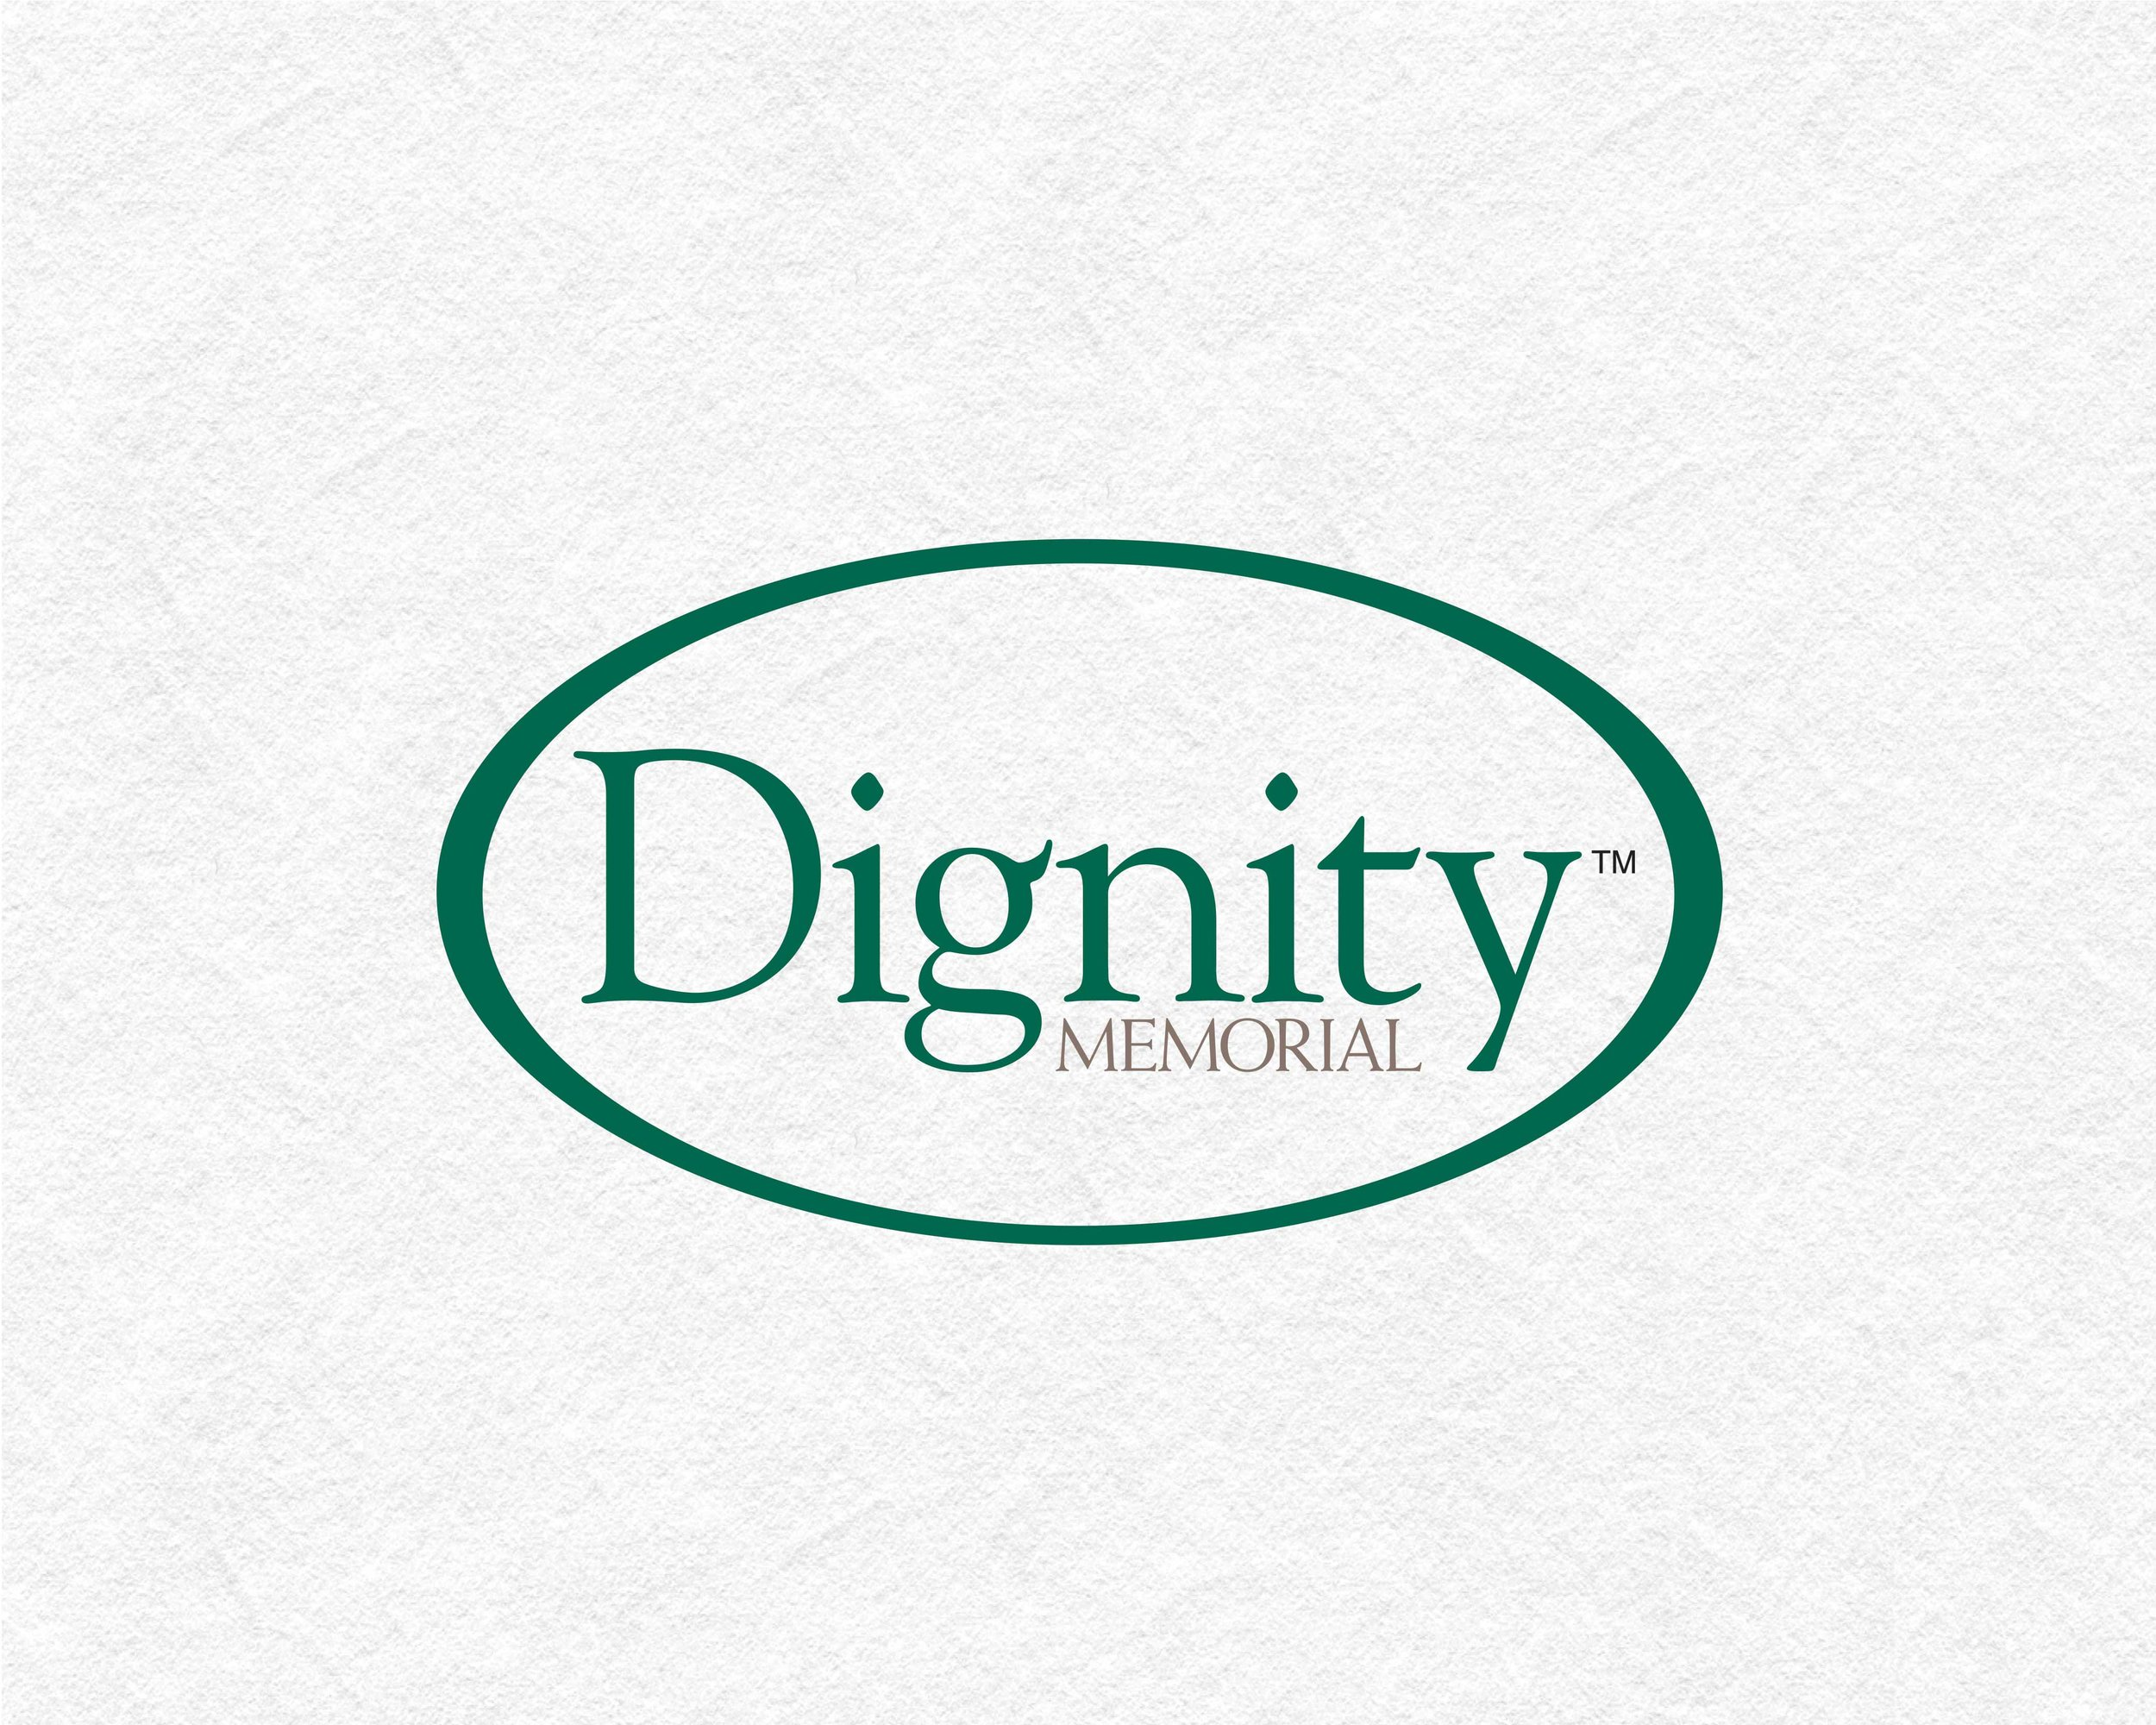 dignitymemorial_logo.jpg